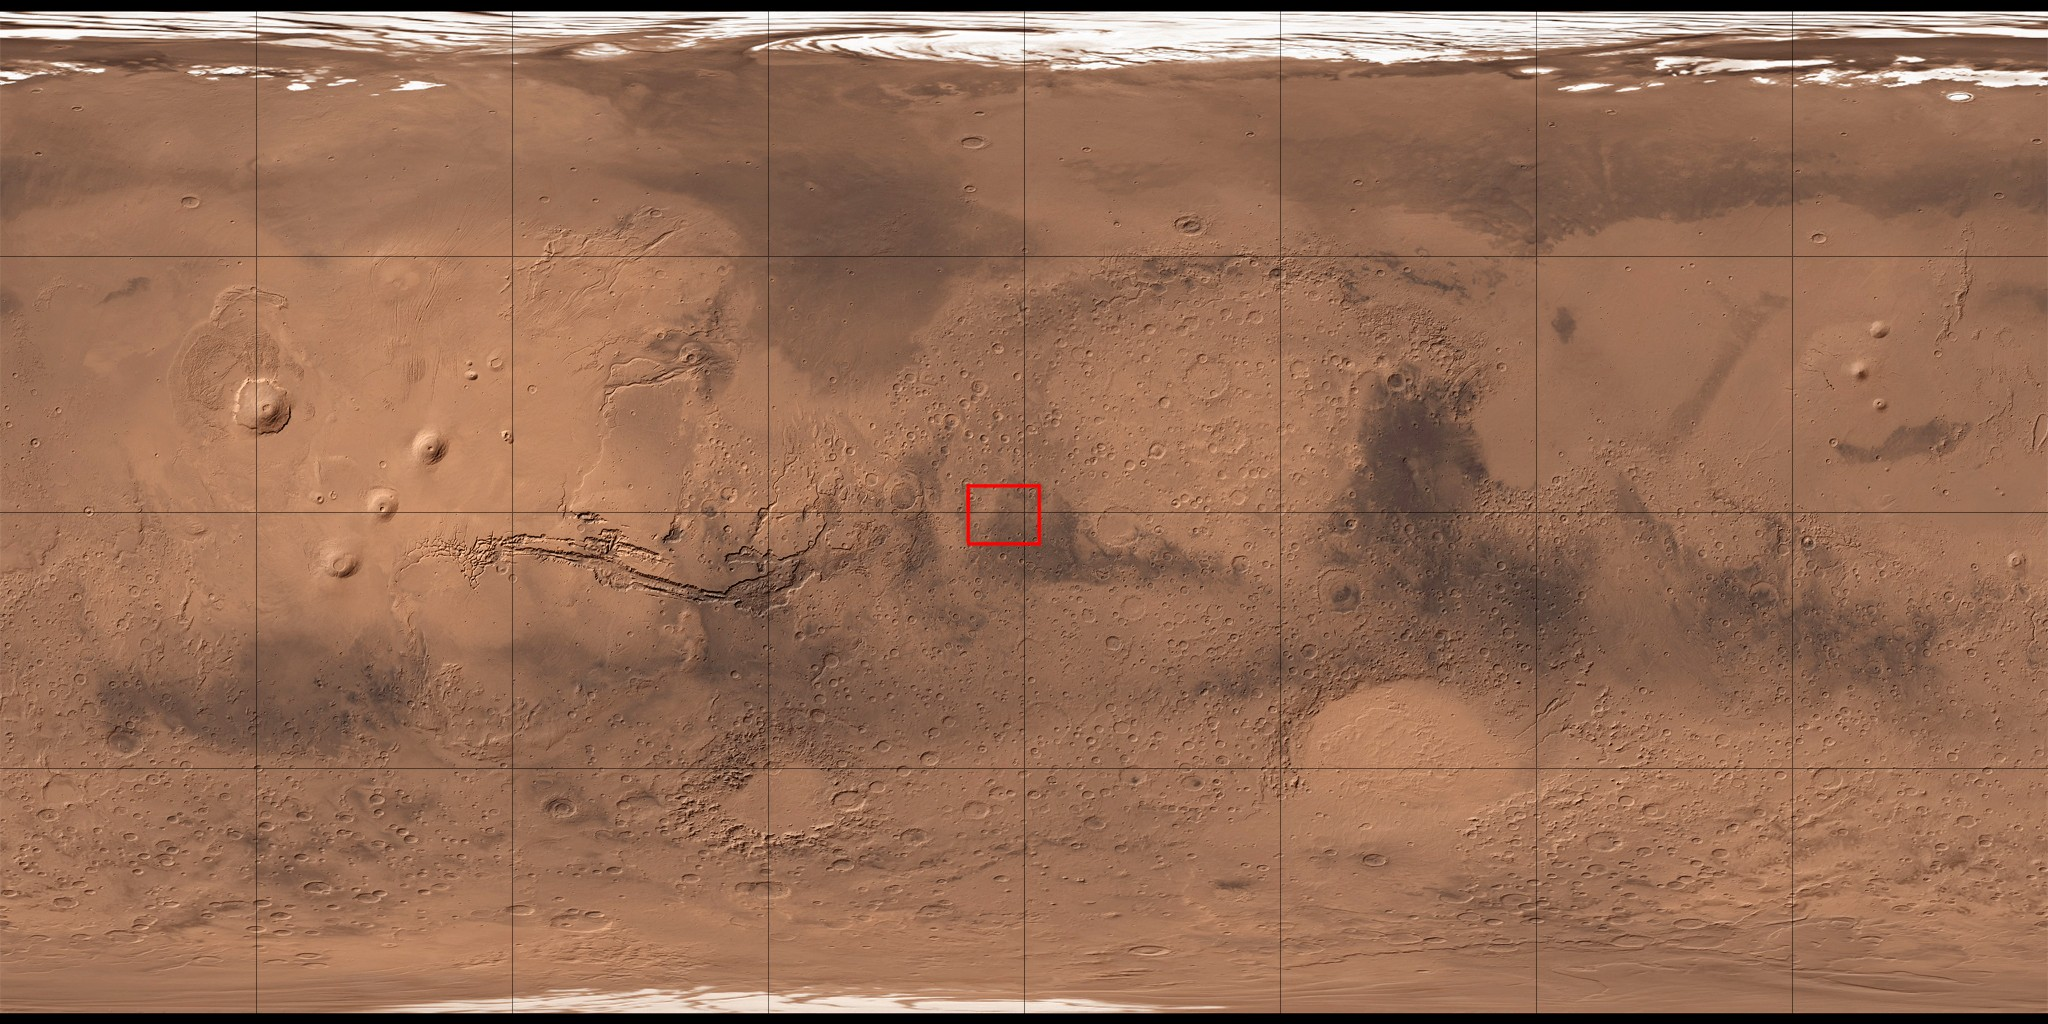 mars_géolocalisation renseigné